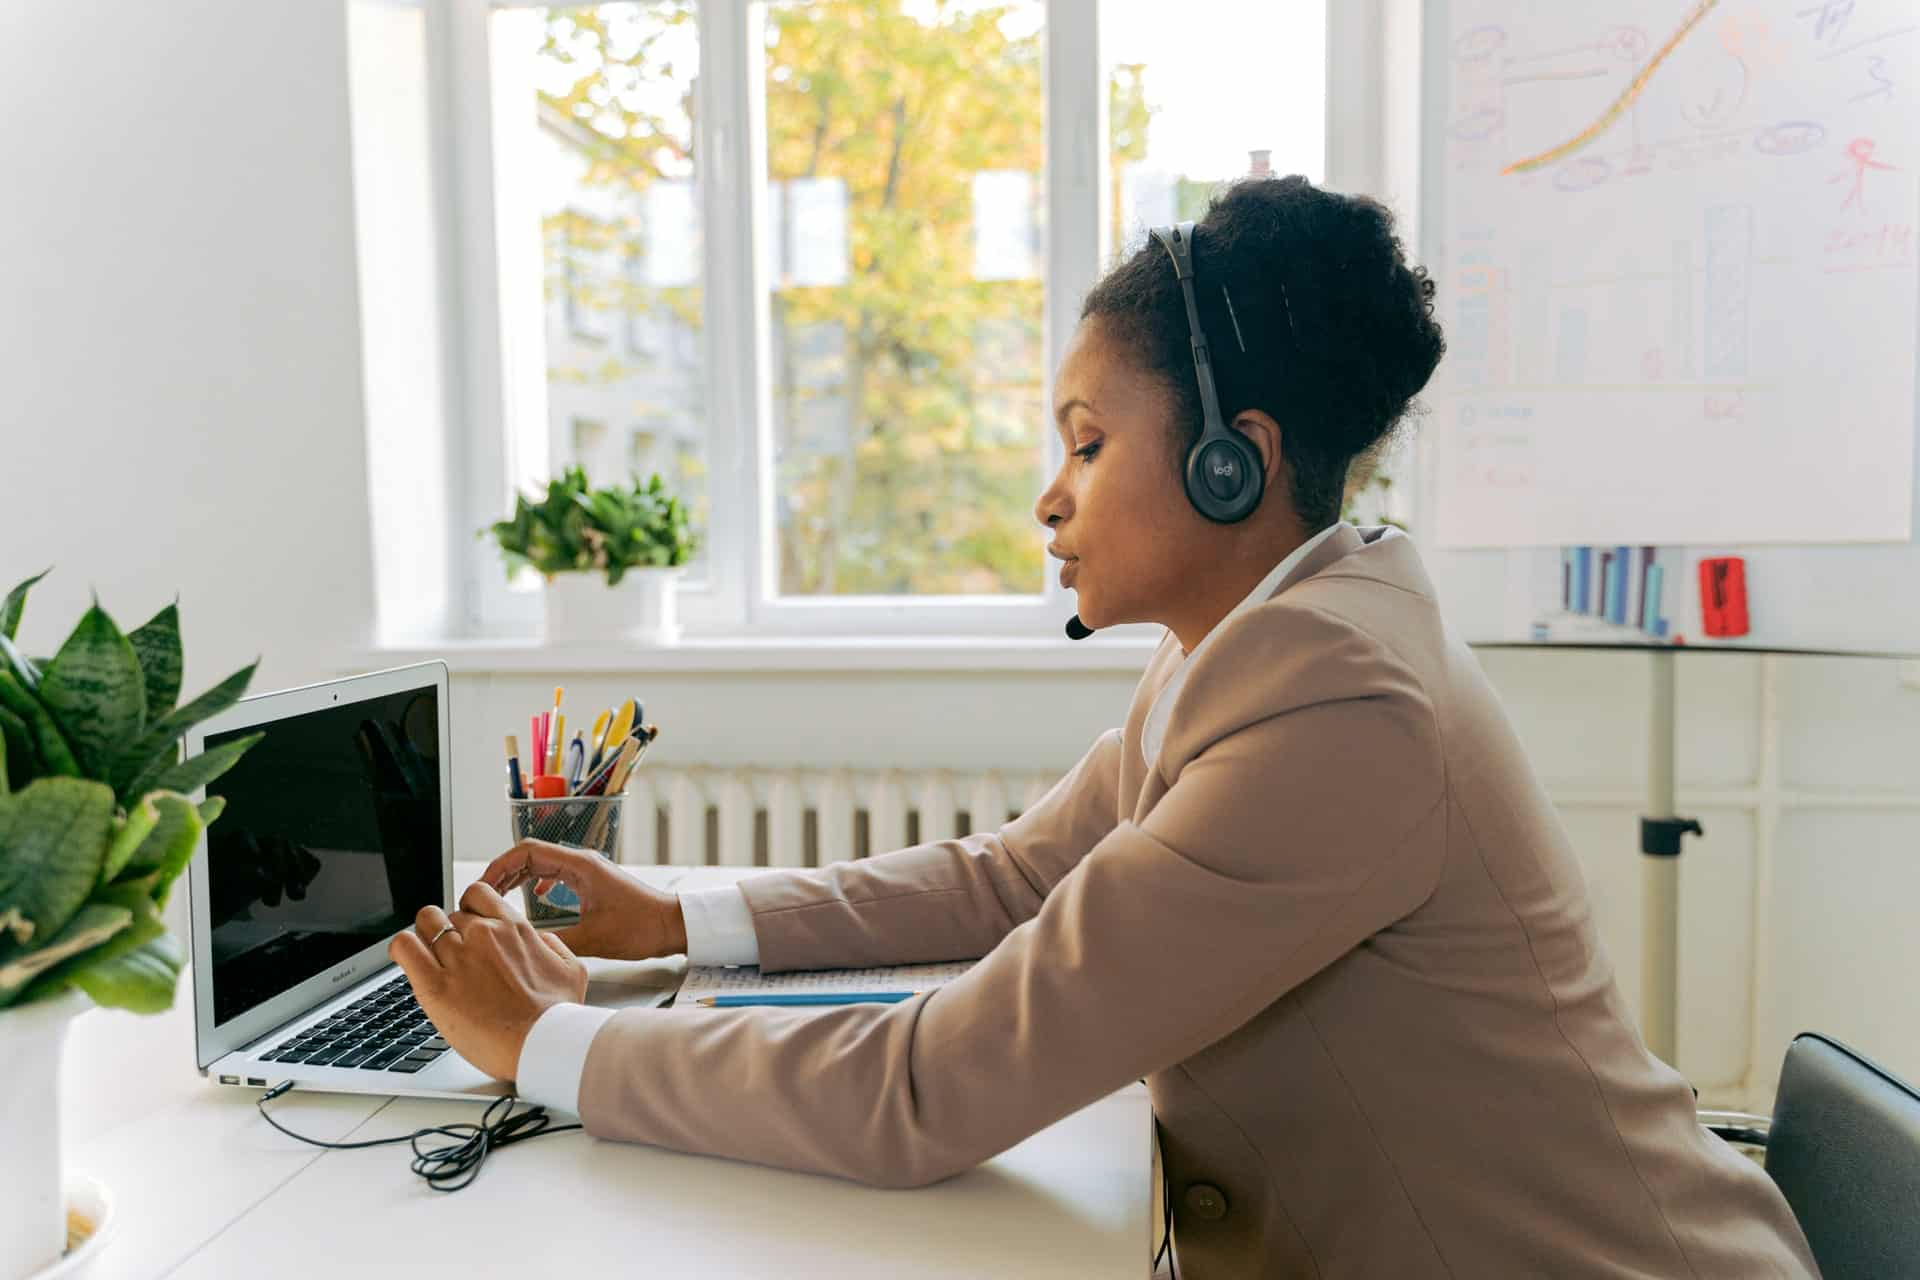 Female customer service agent using laptop